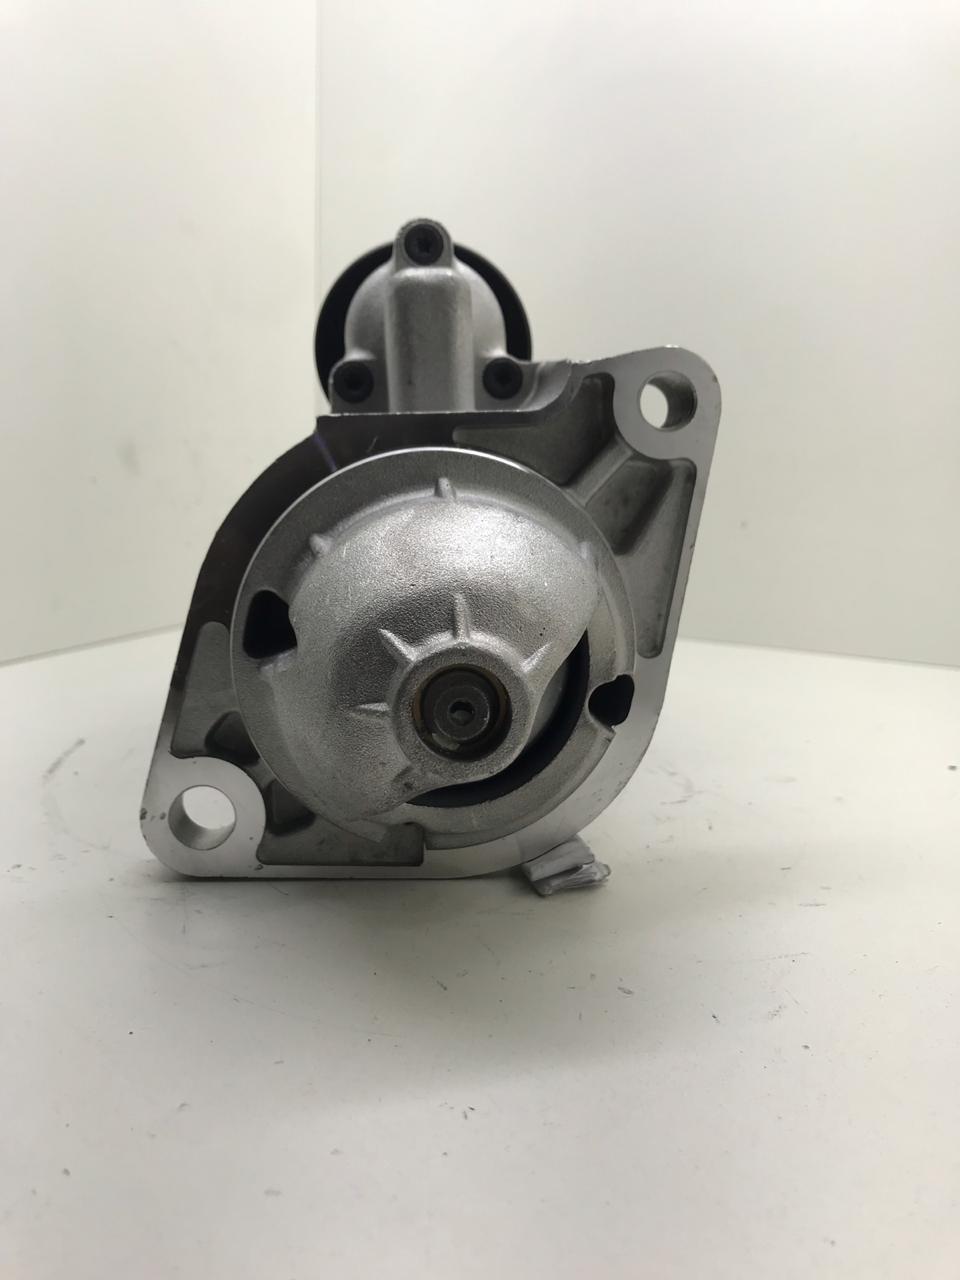 Motor de arranque TOYOTA Hilux 3.0 SW4 3.0 2006 em diante Diesel BOSCH 12V 9 DENTES F000AL0153 F000AL0111 281000L070 281000L072 8097801 20545 2810067070 AEC11078